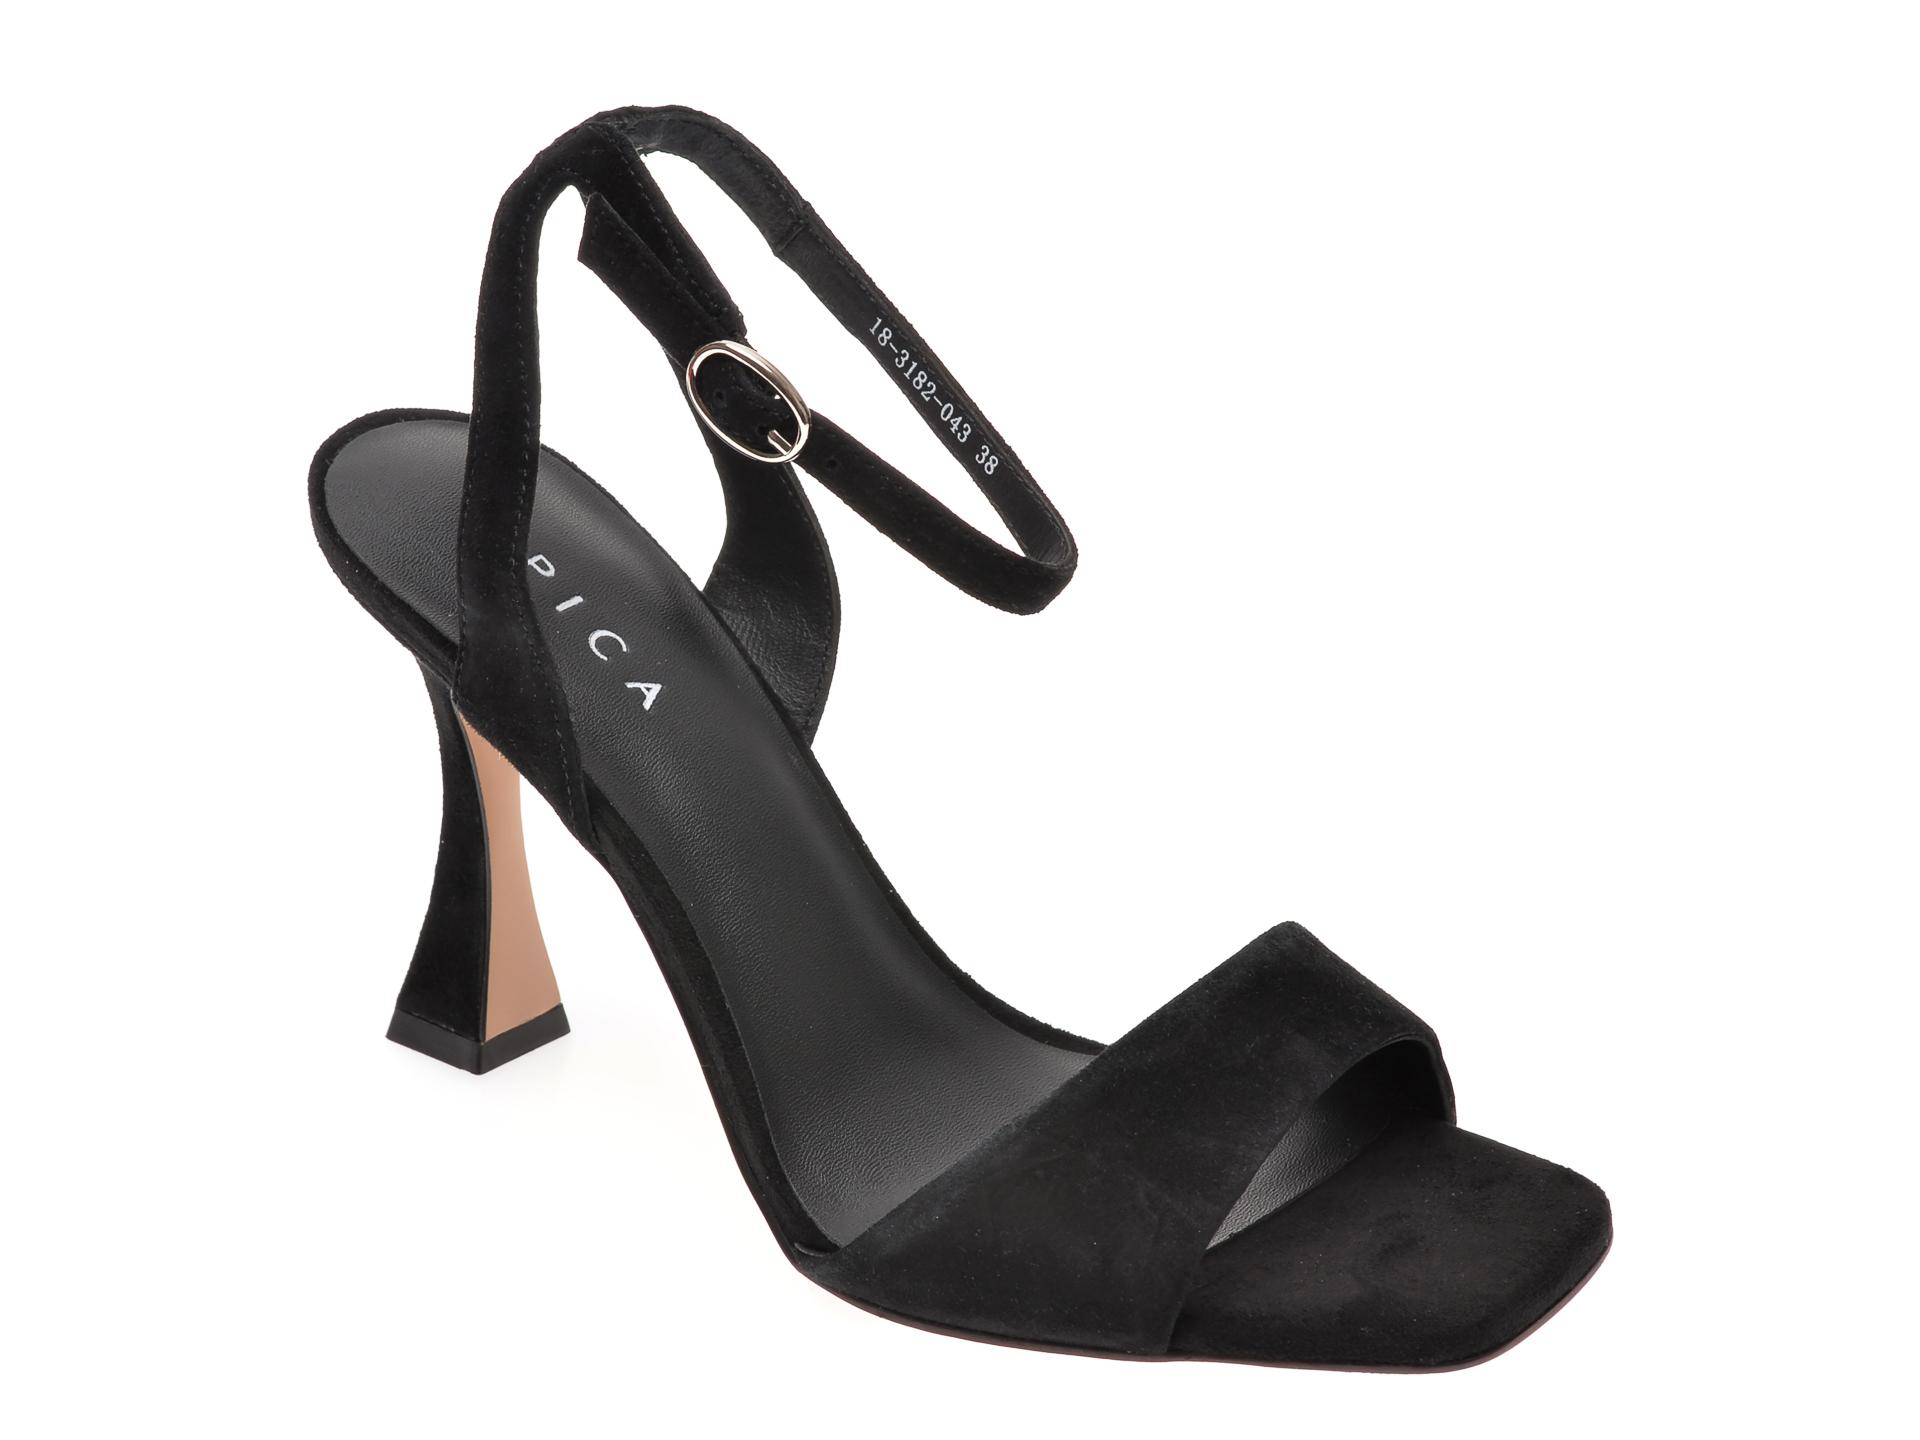 Sandale EPICA negre, 1831820, din piele intoarsa